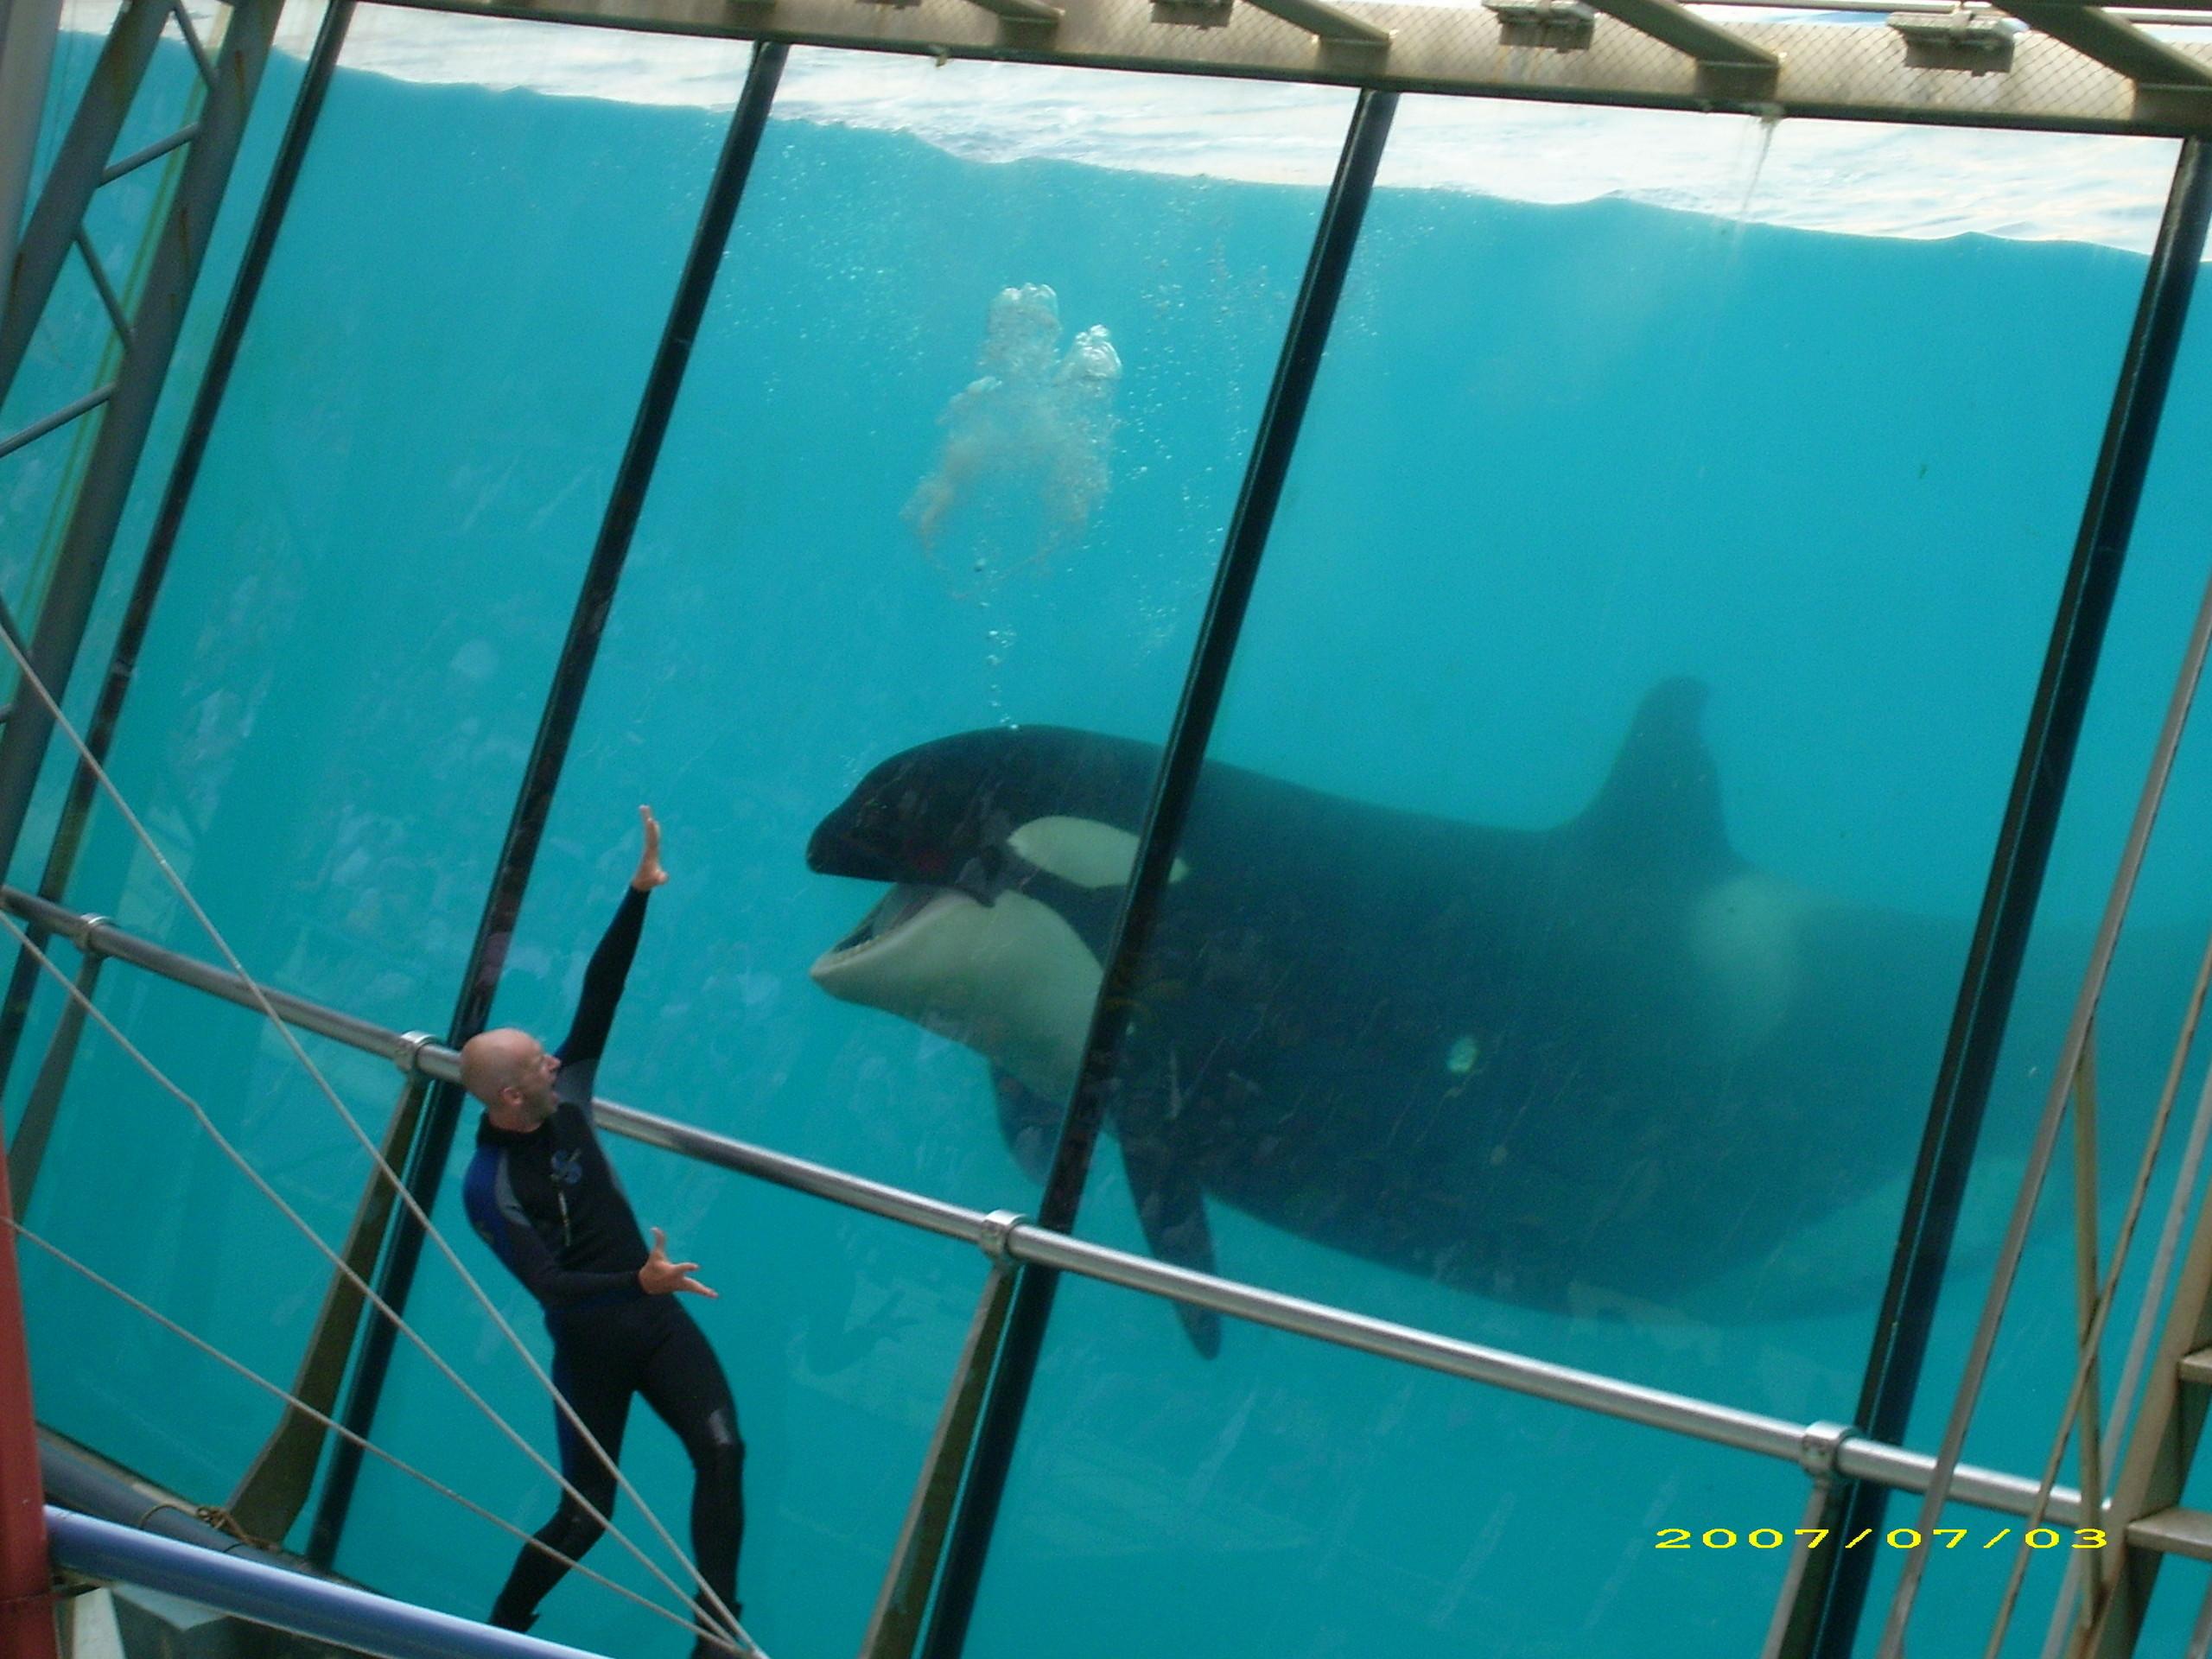 Orca whale wallpaper 56 images 1920x1080 orca wallpaper 9 altavistaventures Image collections